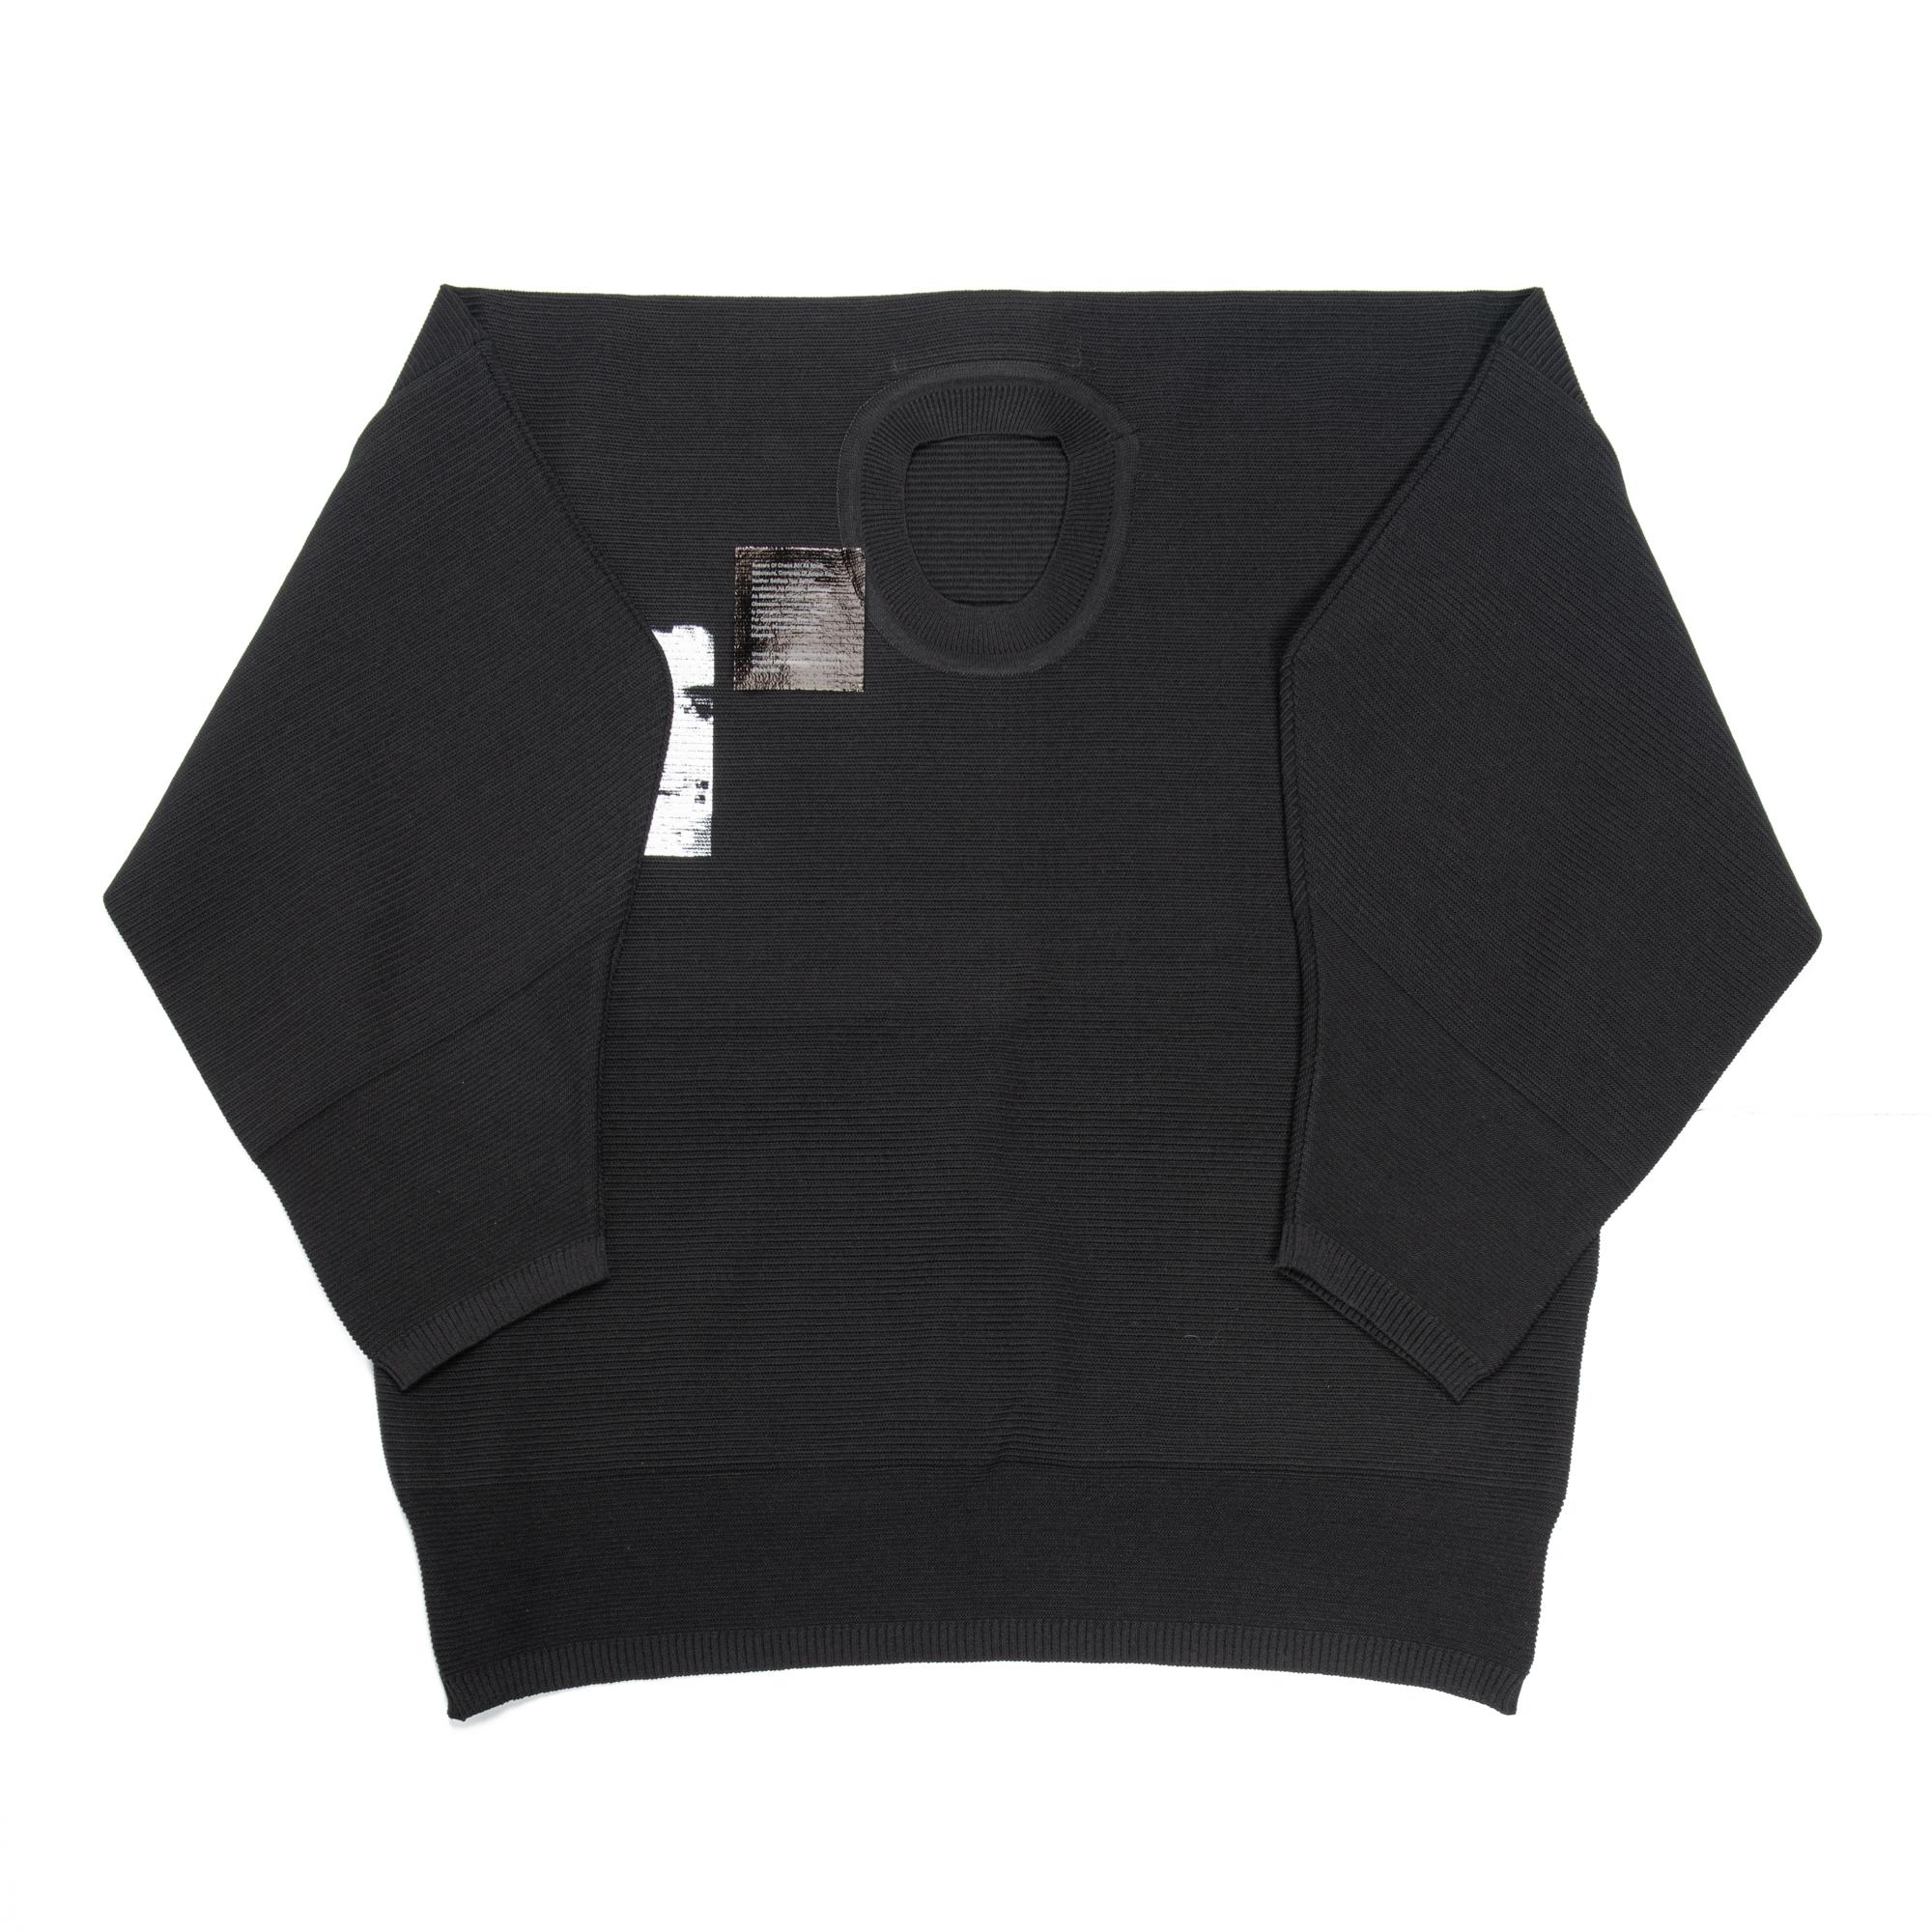 657KNM1-P-BLACK / プリントMIXニッティングシャツ